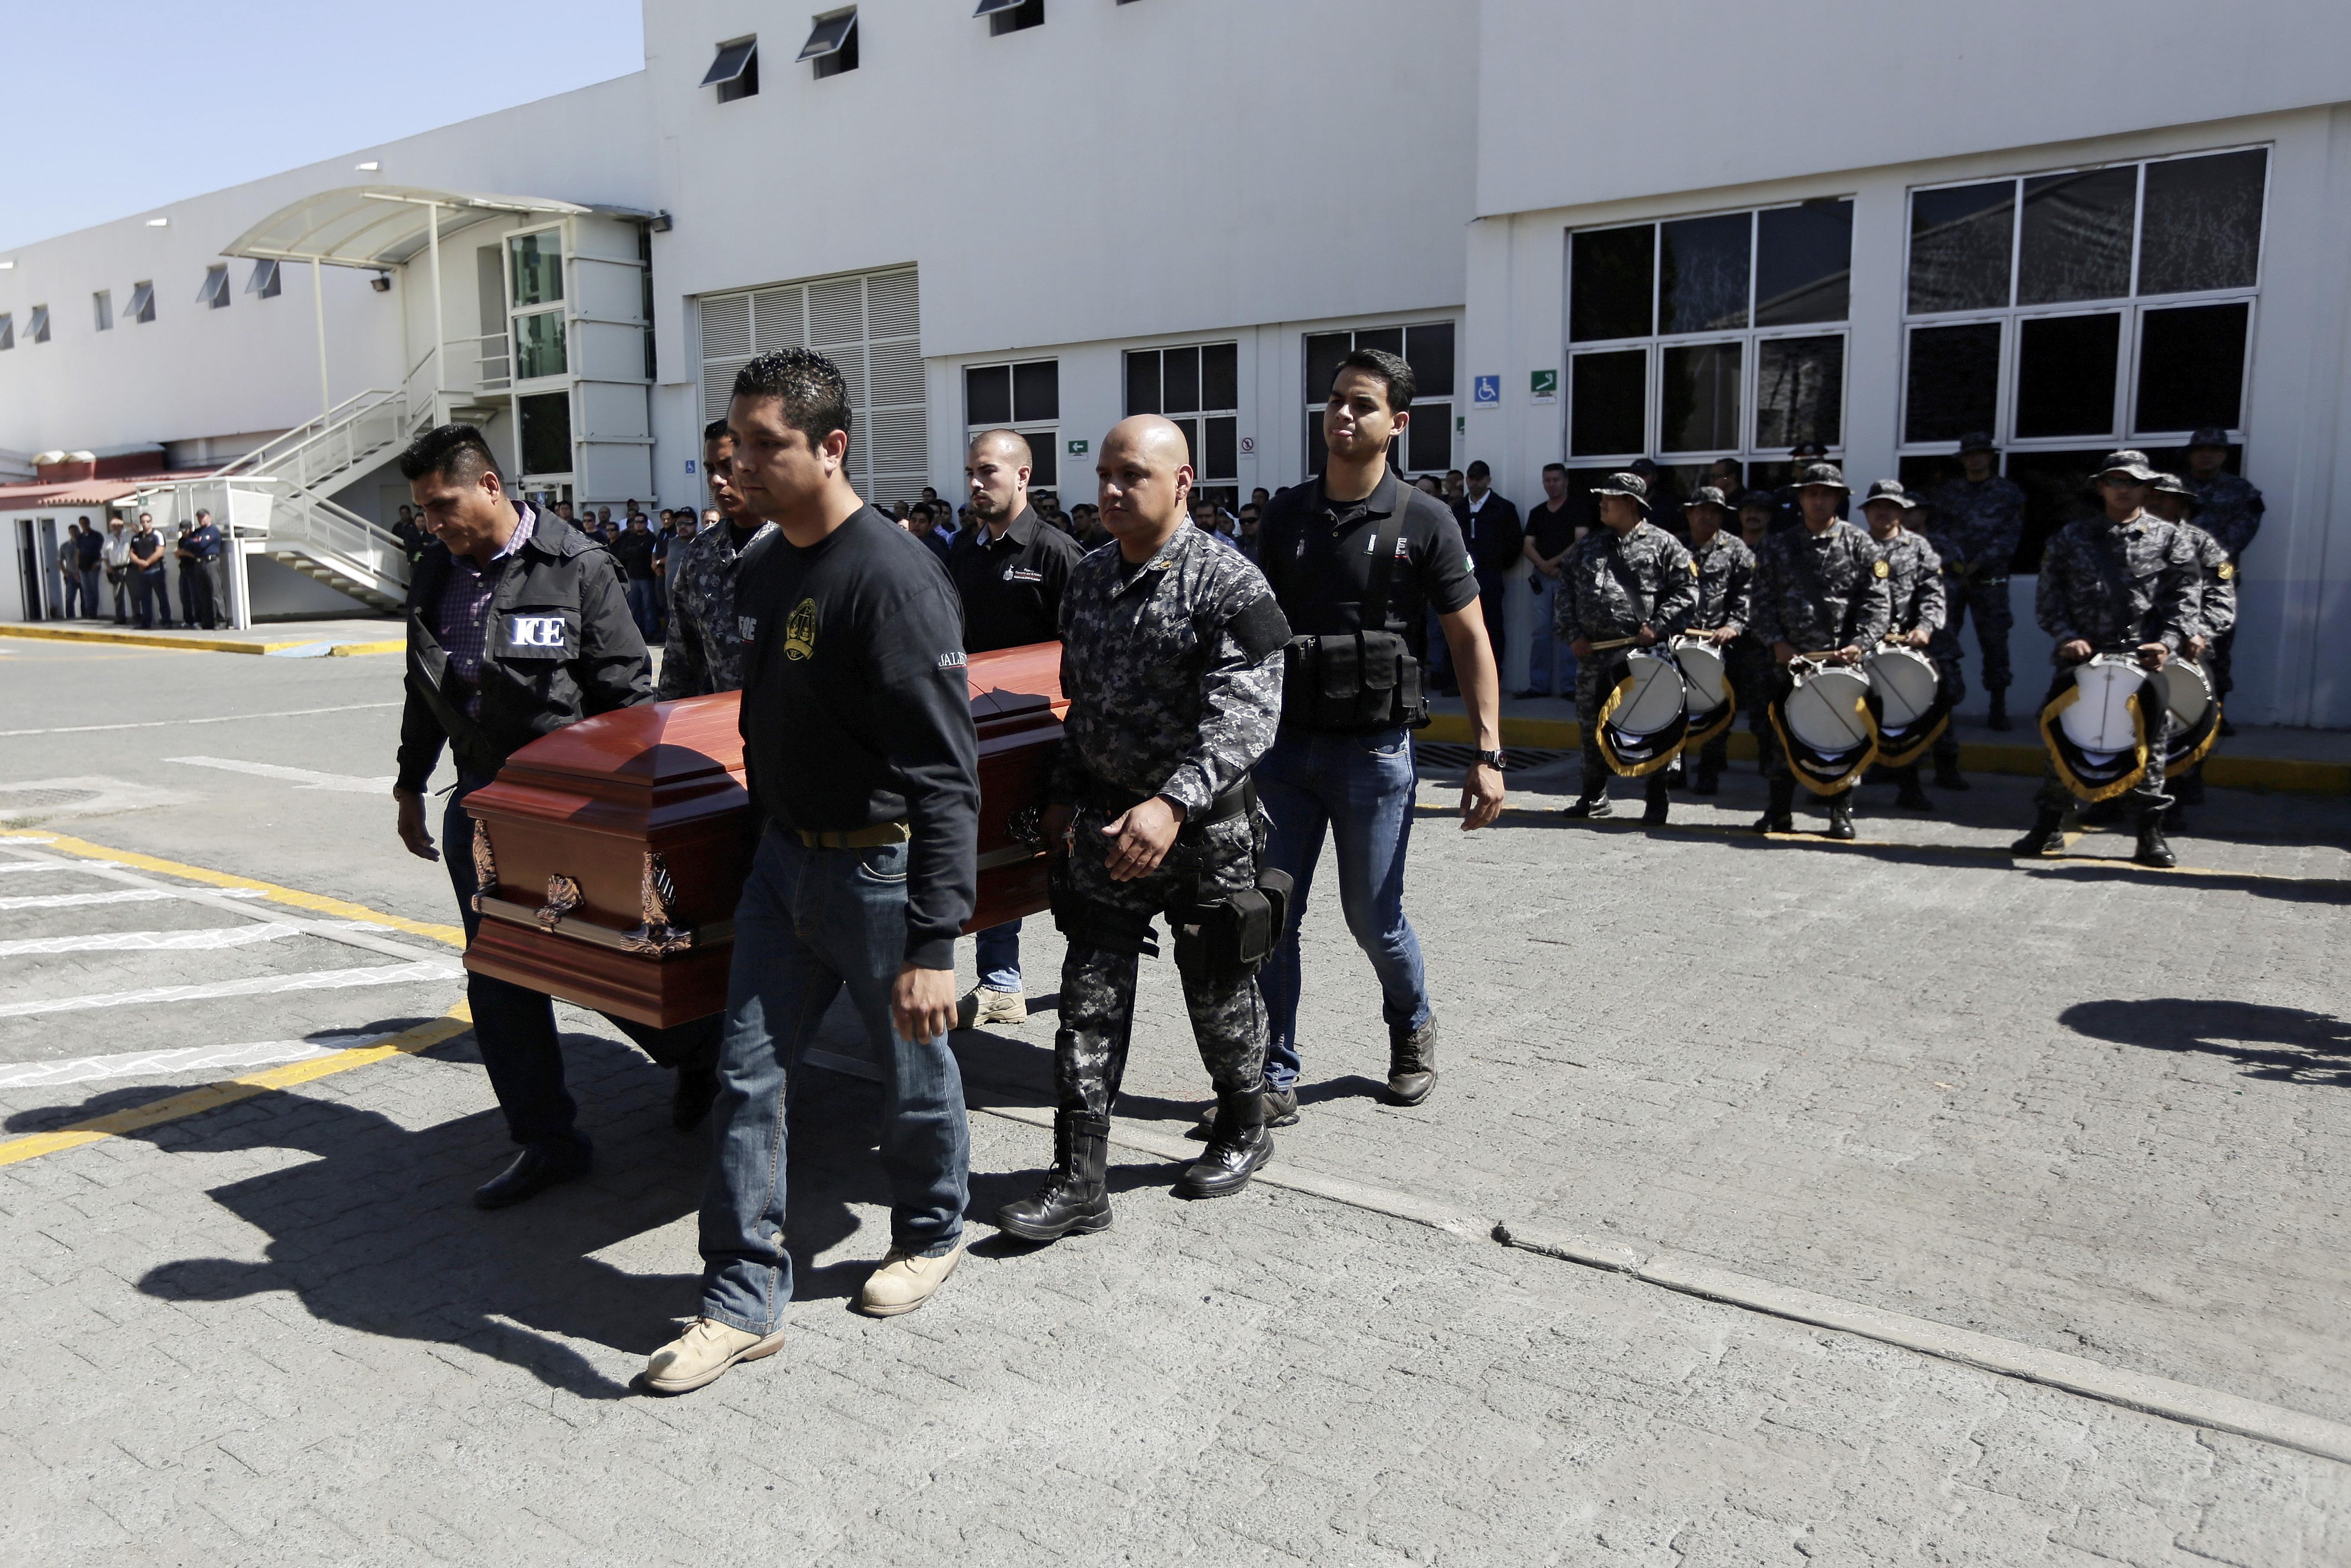 violent new drug cartel alarming authorities in mexico cbs news. Black Bedroom Furniture Sets. Home Design Ideas